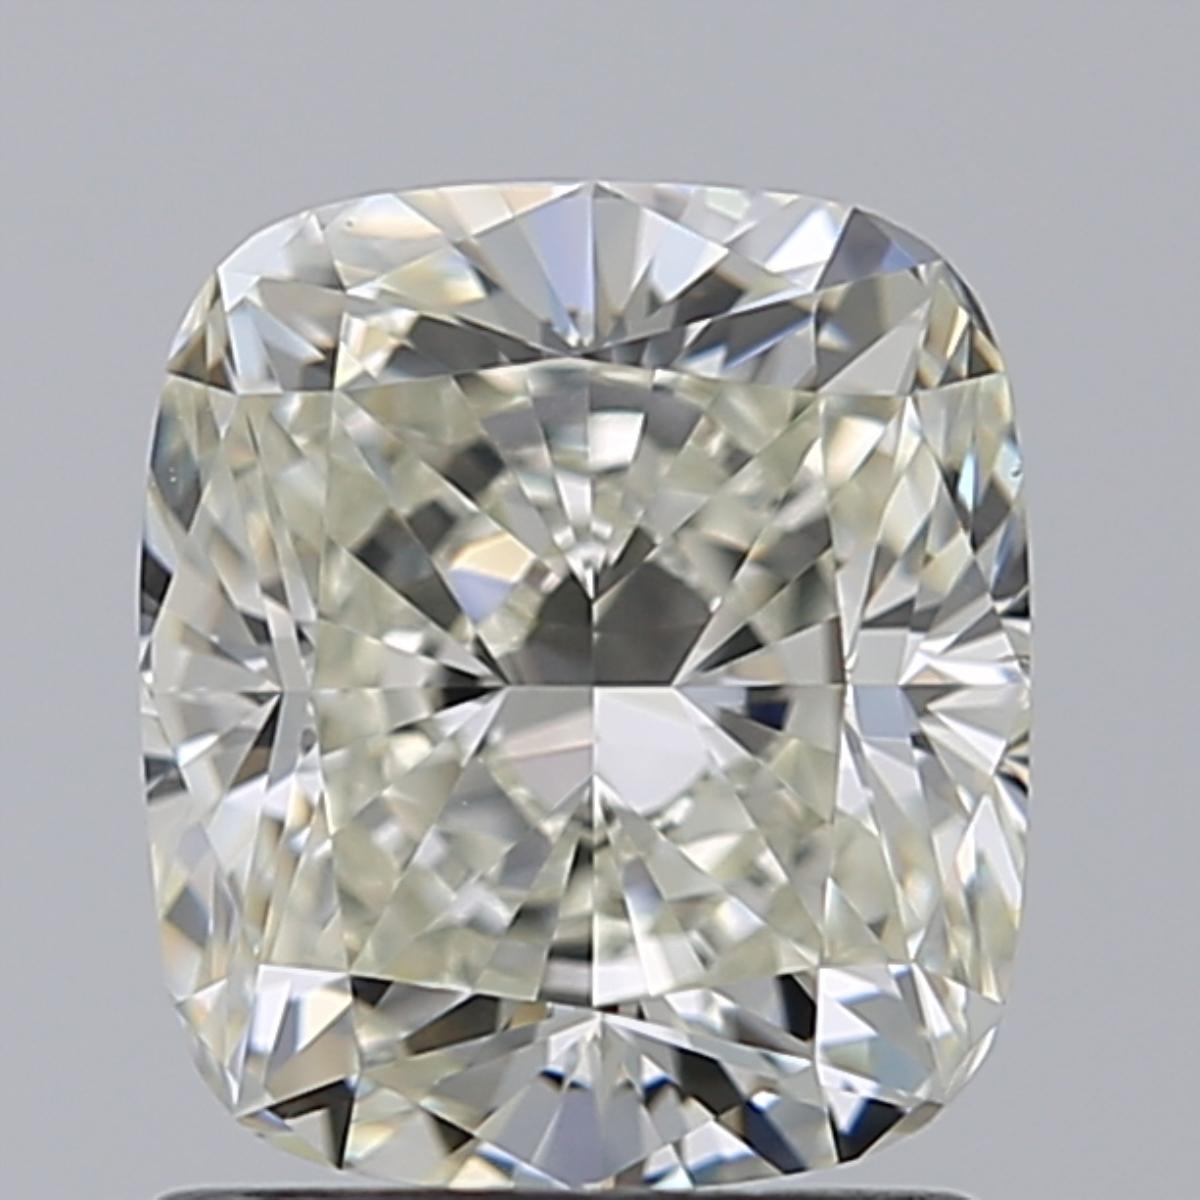 1.51 ct Cushion Cut Diamond : L / VS2